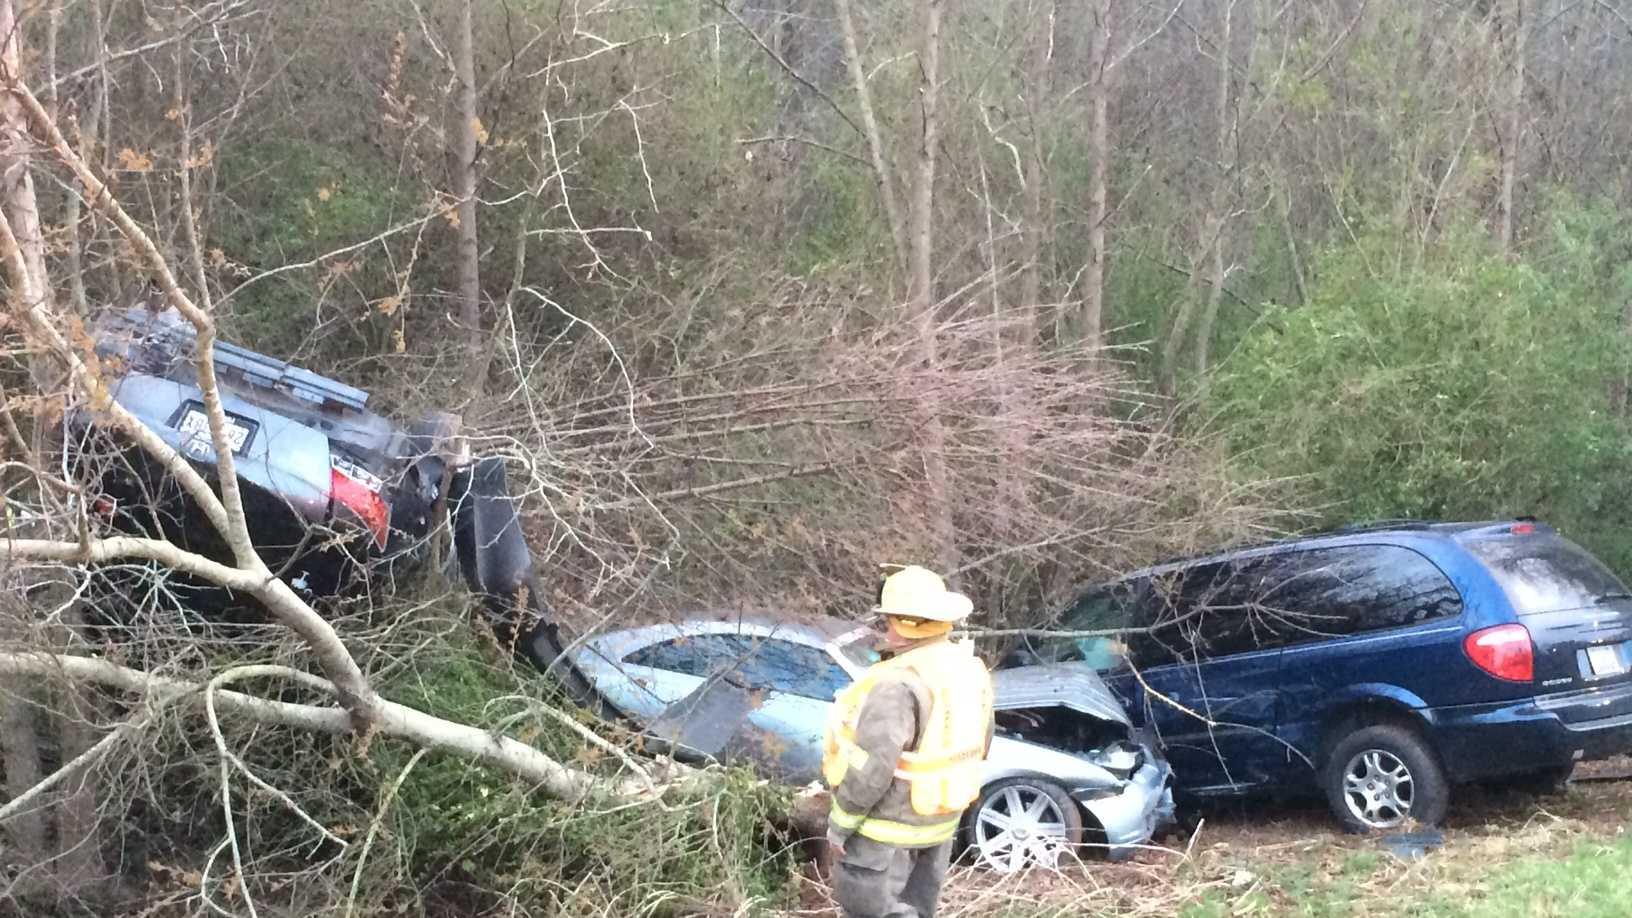 The South Carolina Highway Patrol is investigating a crash involving three cars and three injuries.